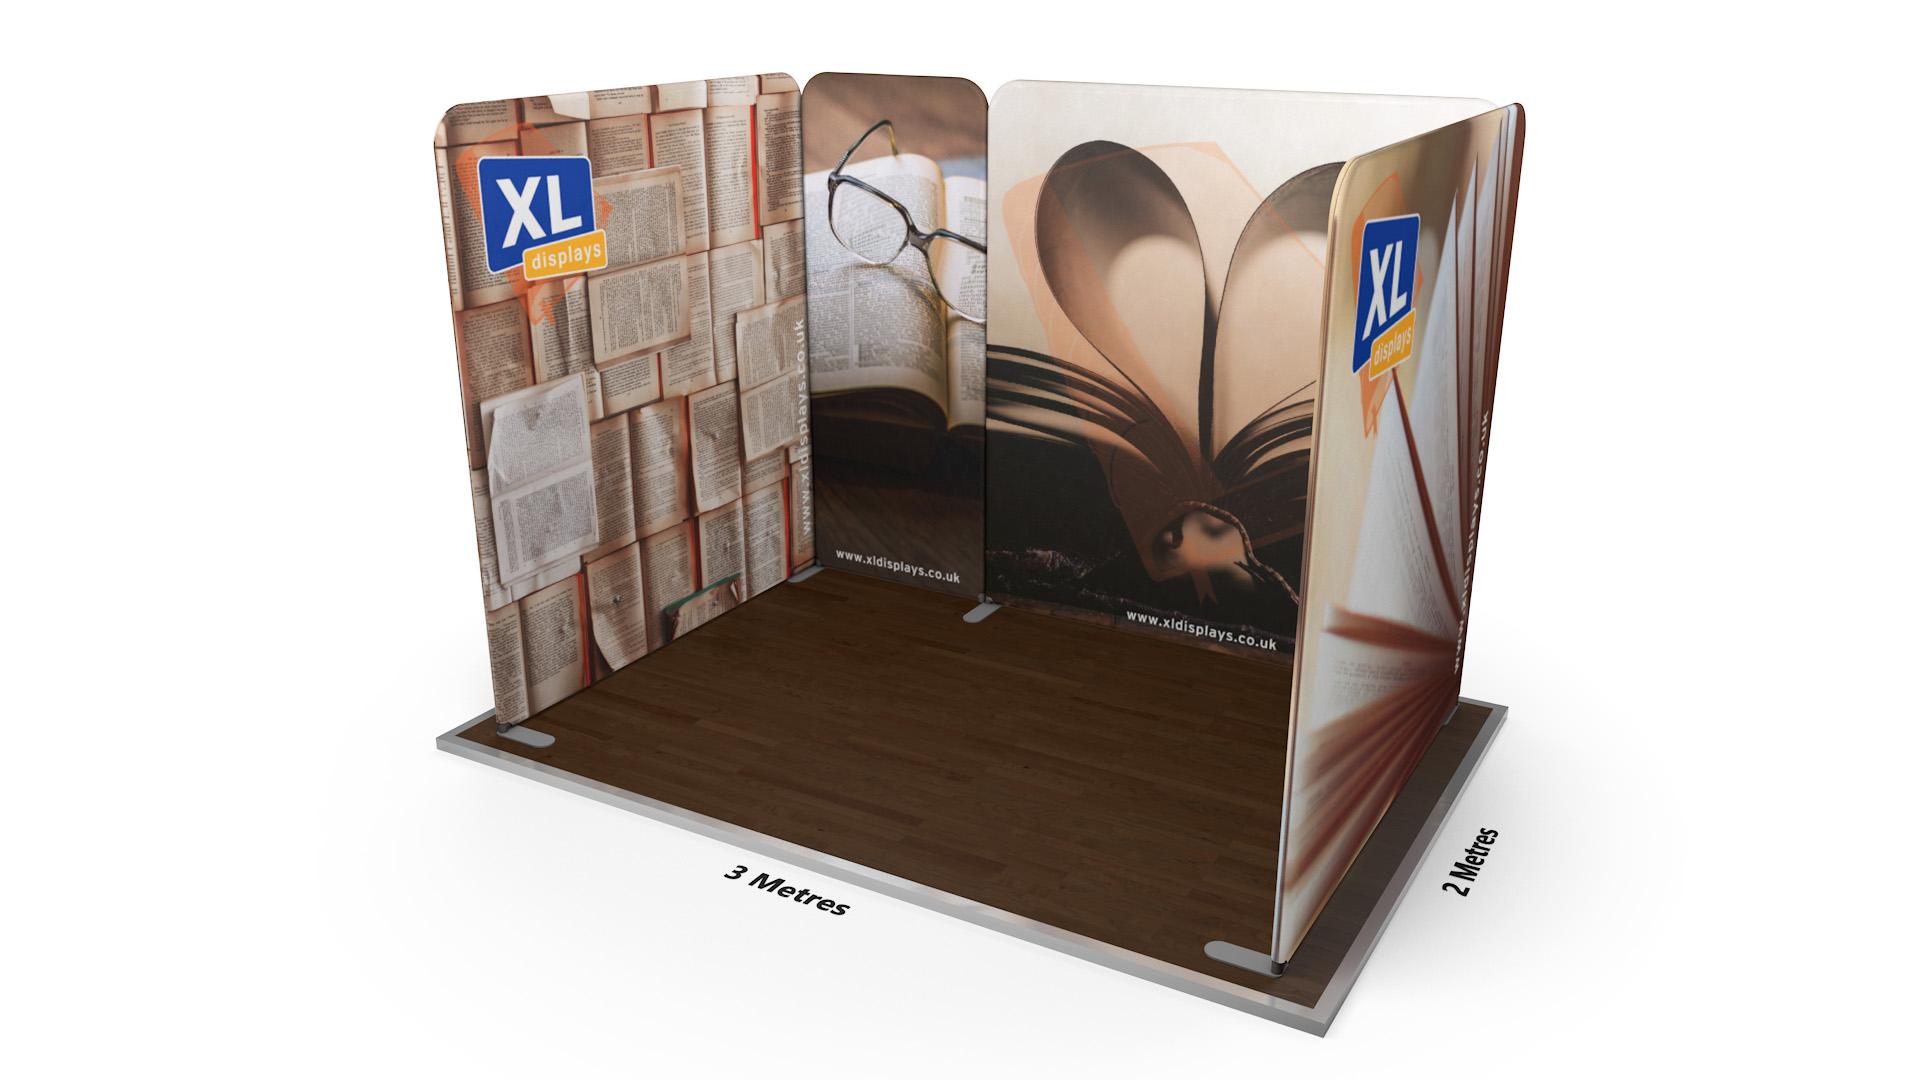 Modulate<sup>™</sup> 3m x 2m U-Shaped Fabric Display Stand